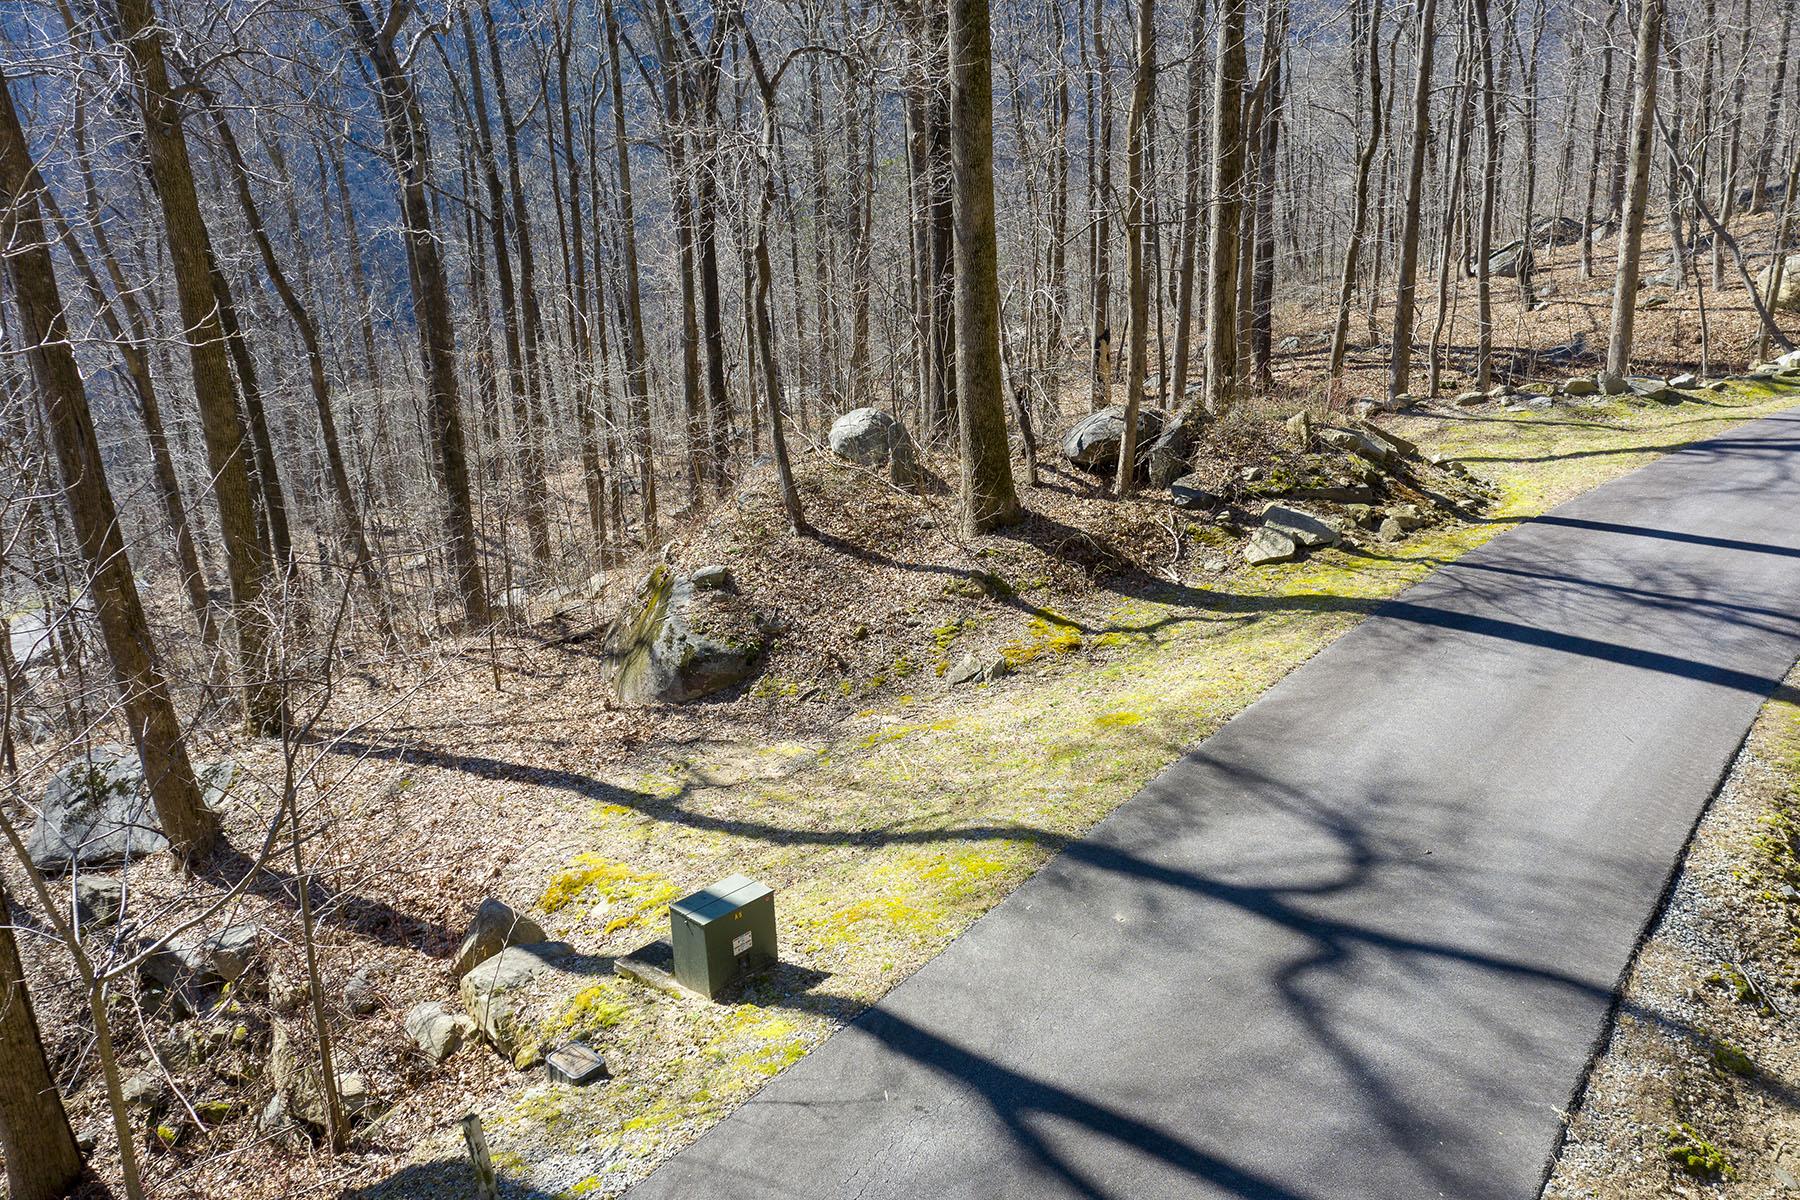 Land for Sale at 21 Cascada Vista Dr Chimney Rock, North Carolina 28720 United States